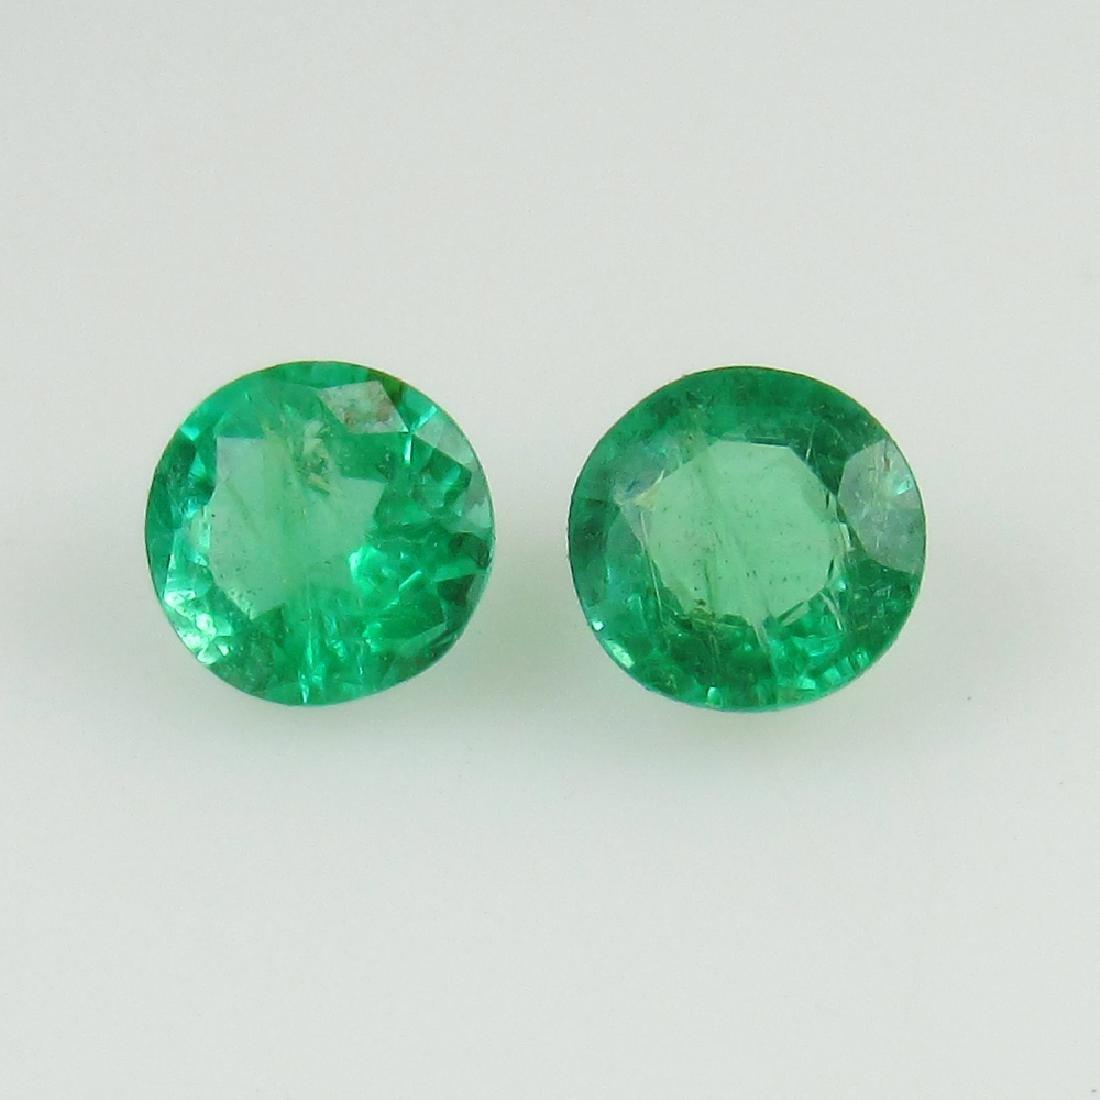 0.55 Ct Genuine Loose Zambian Emerald 4.2 mm Round Pair